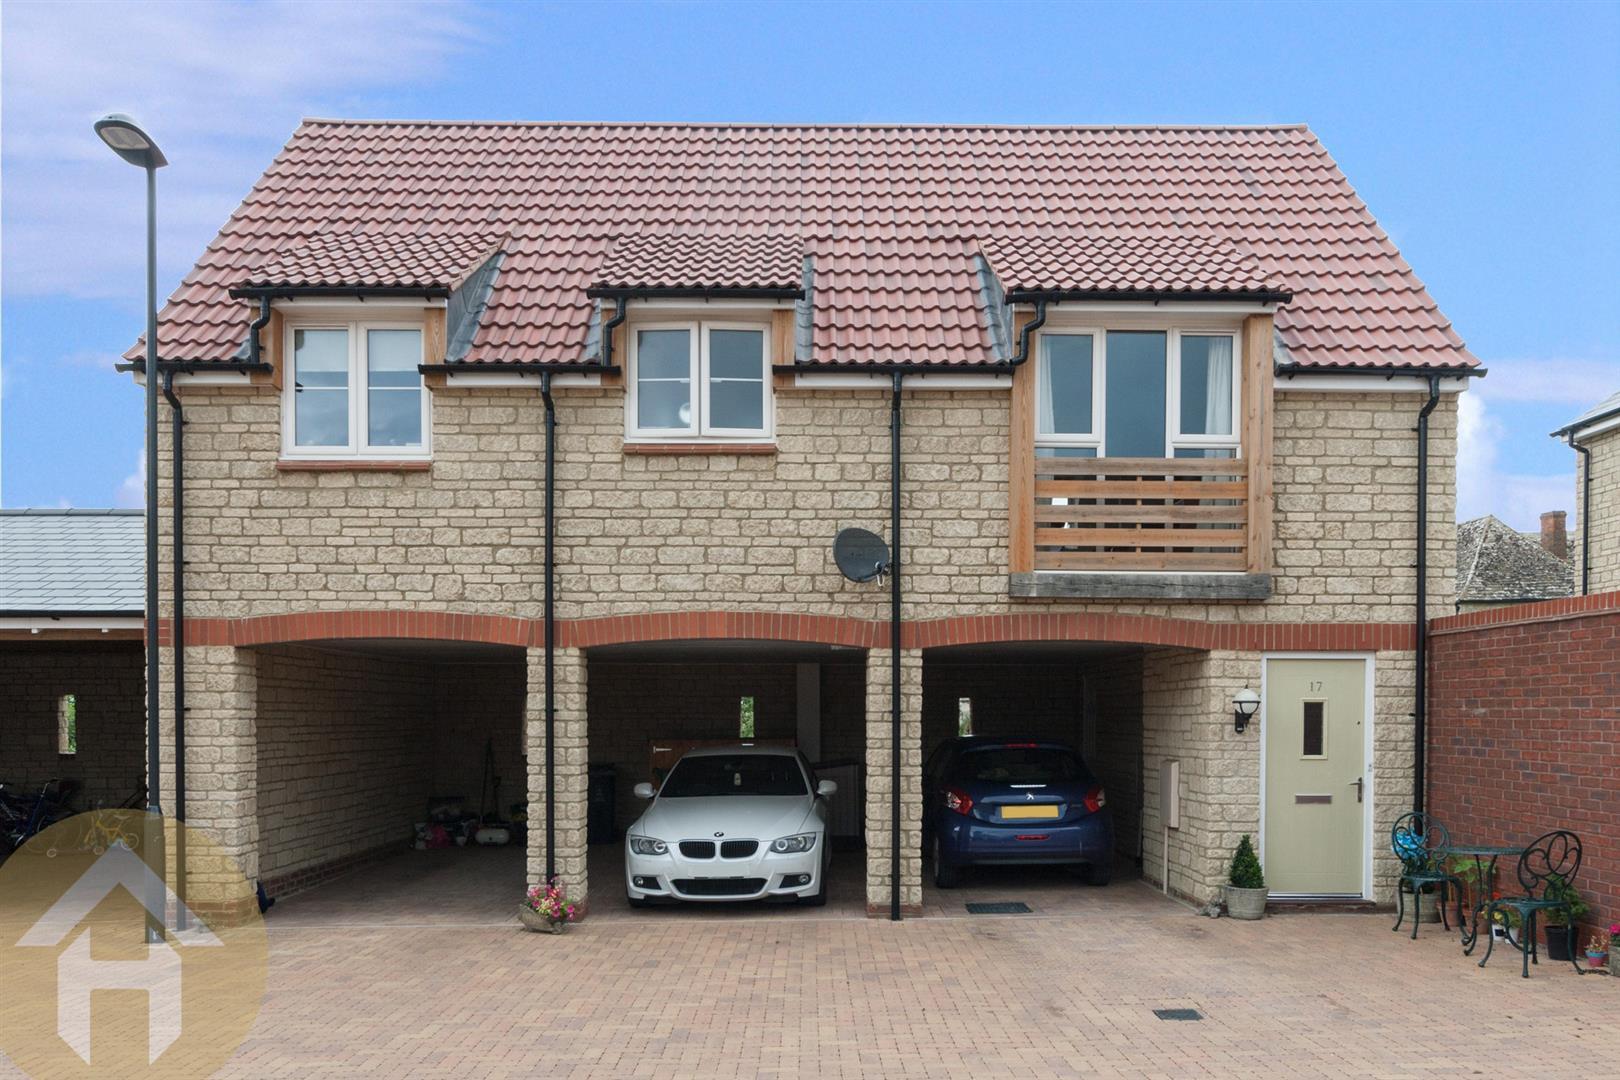 2 Bedrooms Property for sale in Tadpole Garden Village, Swindon